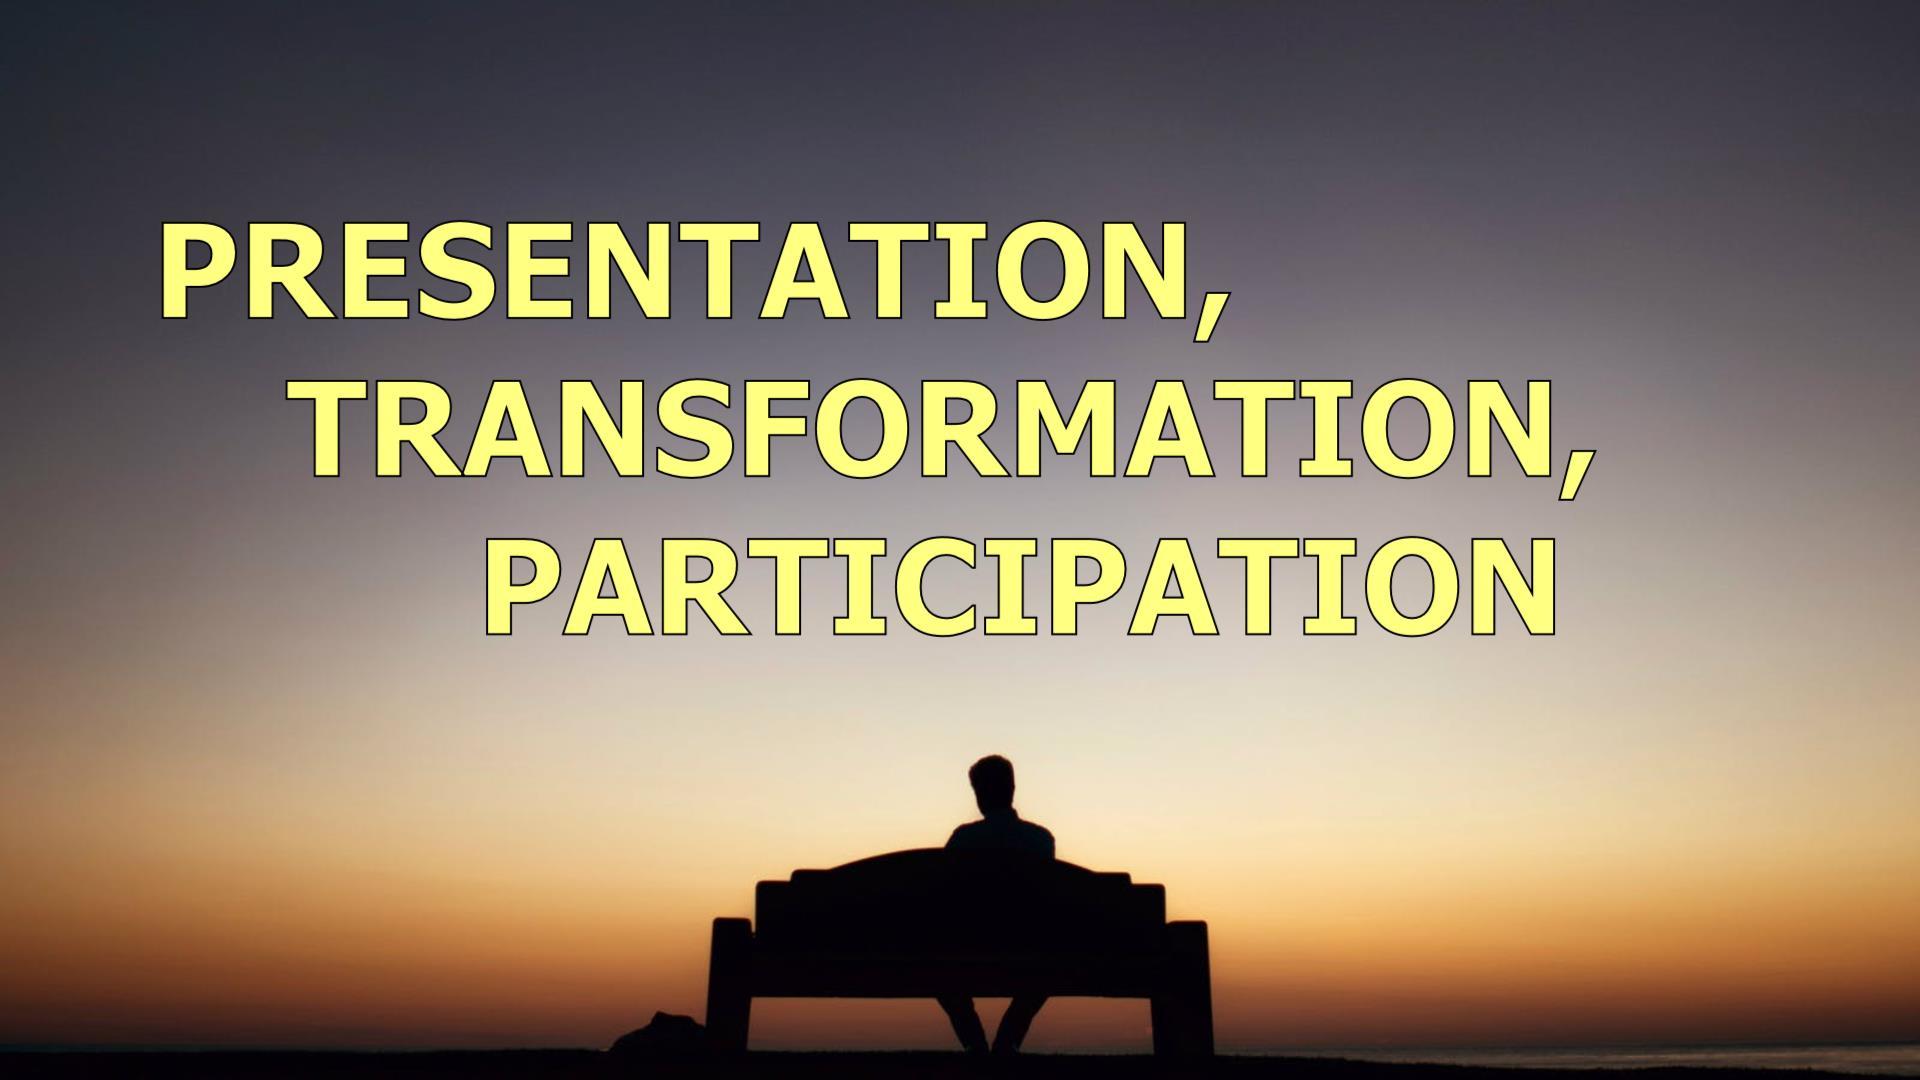 Presentation, Transformation, Participation